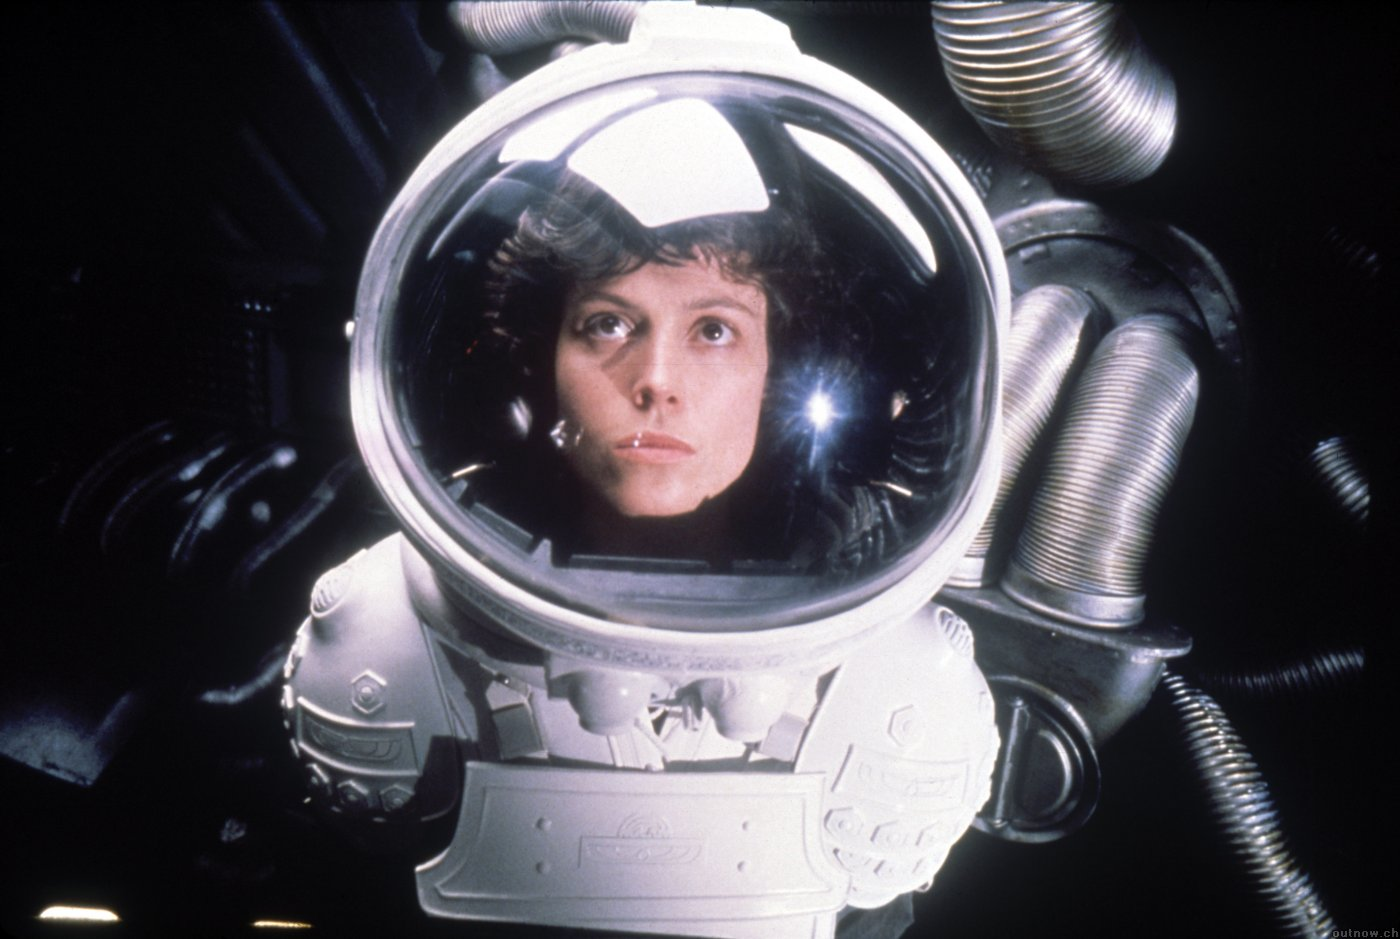 http://3.bp.blogspot.com/-0W2I6BFcgoE/T-tzR3cfJsI/AAAAAAAAARM/LL-d8NHTEc4/s1600/alien-1979-sigourney-weaver-photo-2.jpg